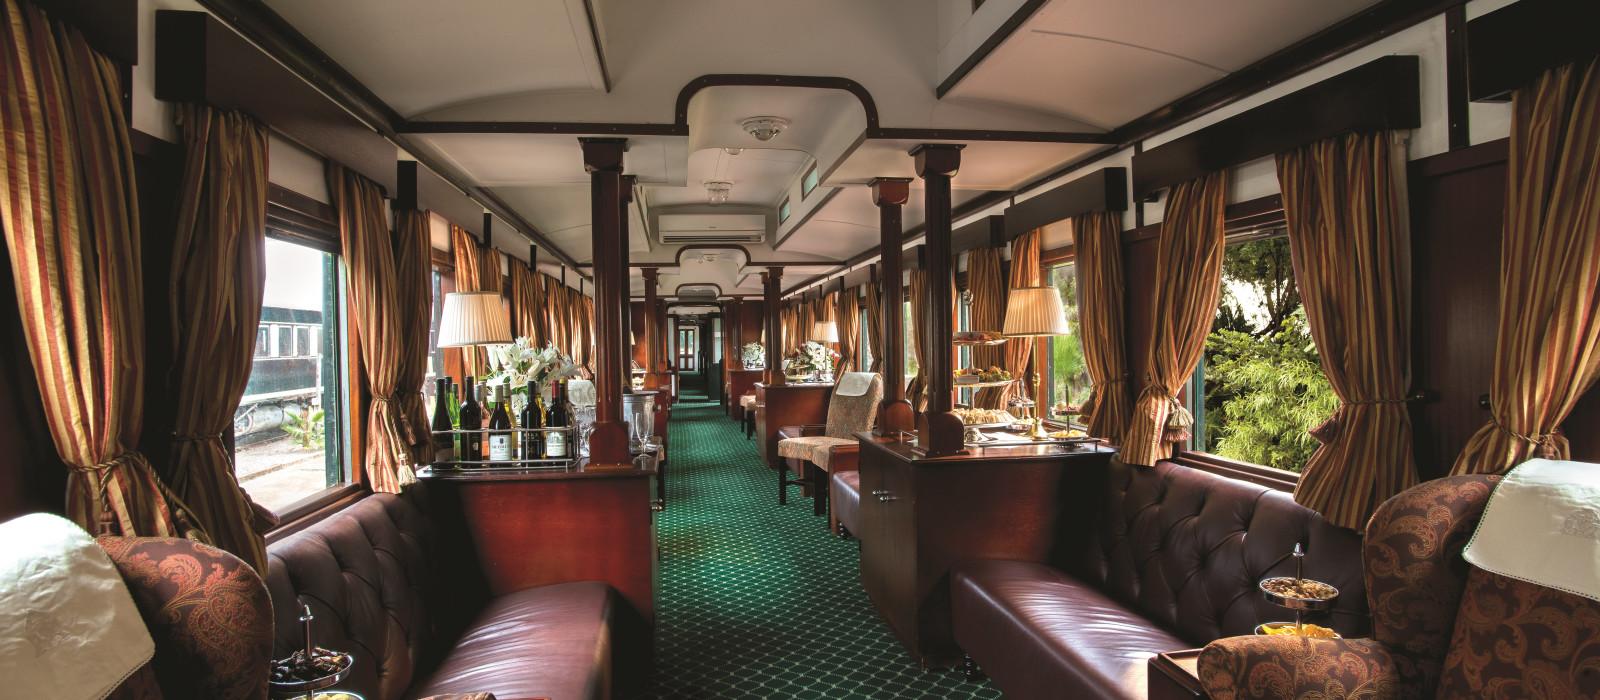 Hotel Rovos Rail: Viktoriafälle – Pretoria Südafrika